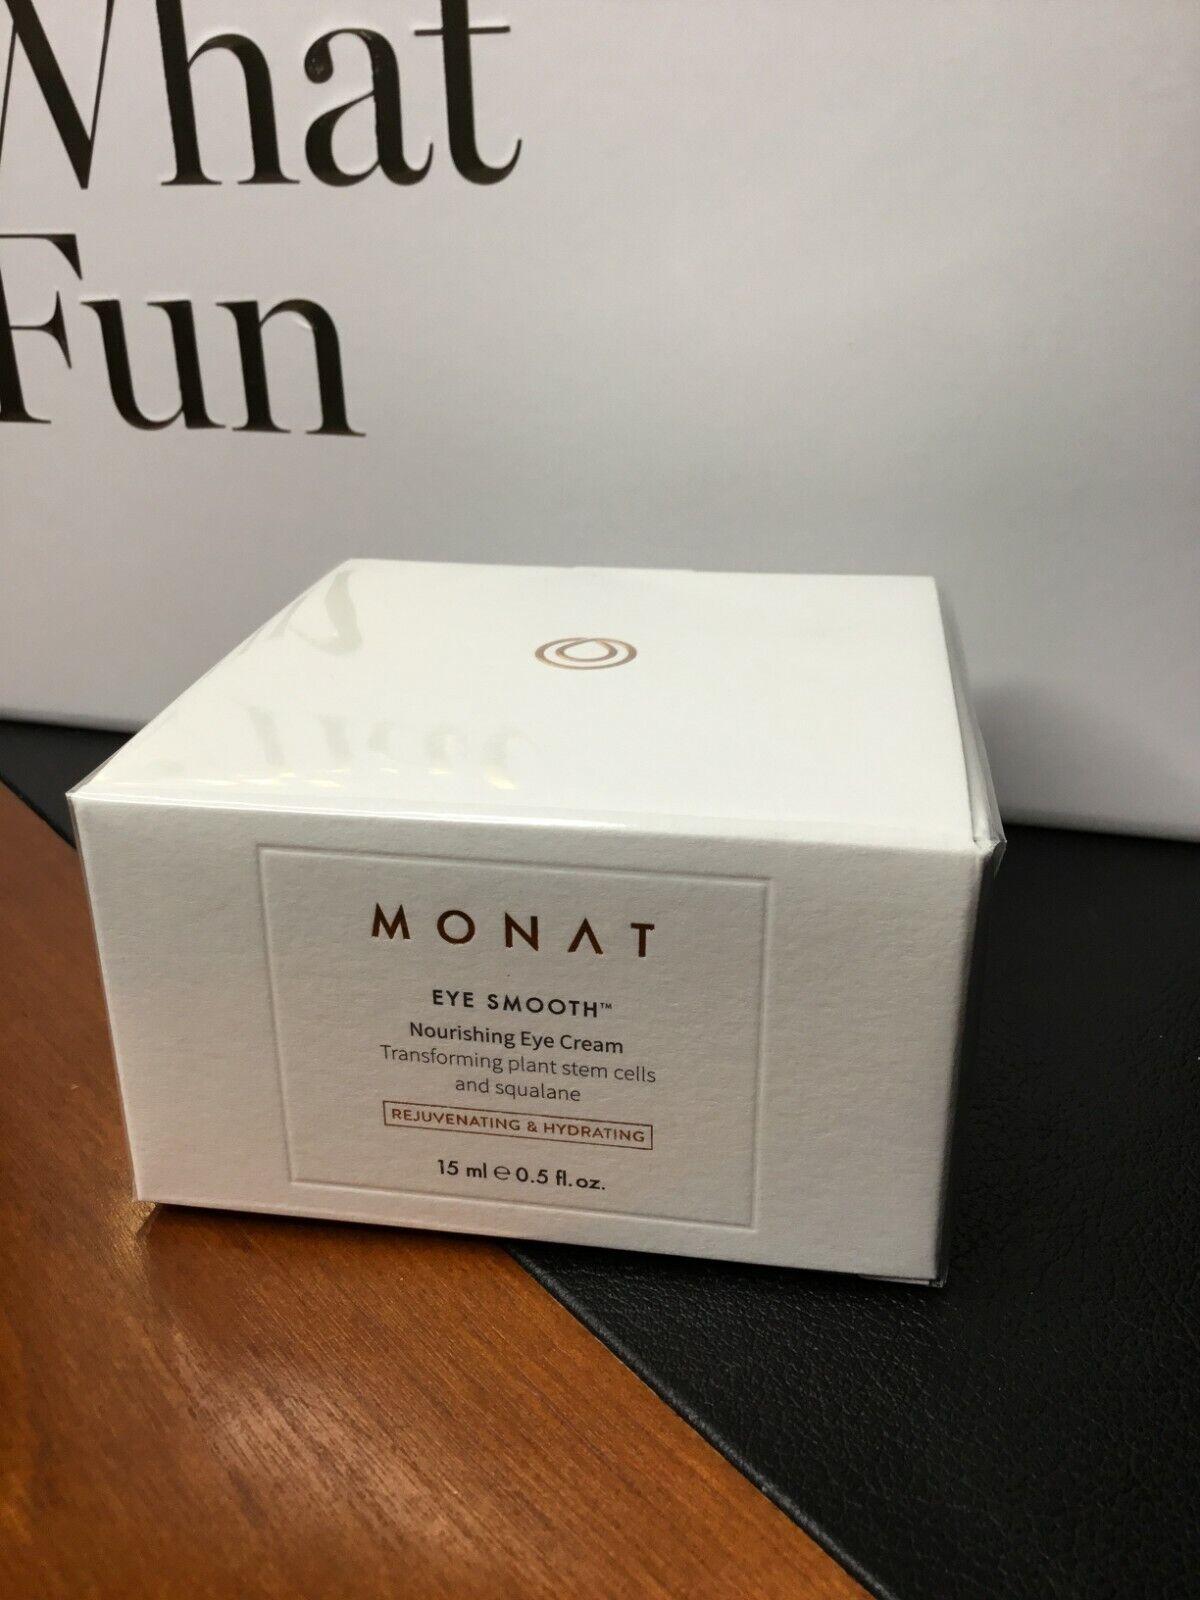 Monat Eye Smooth Nourishing Eye Cream 0 5 Oz New Sealed